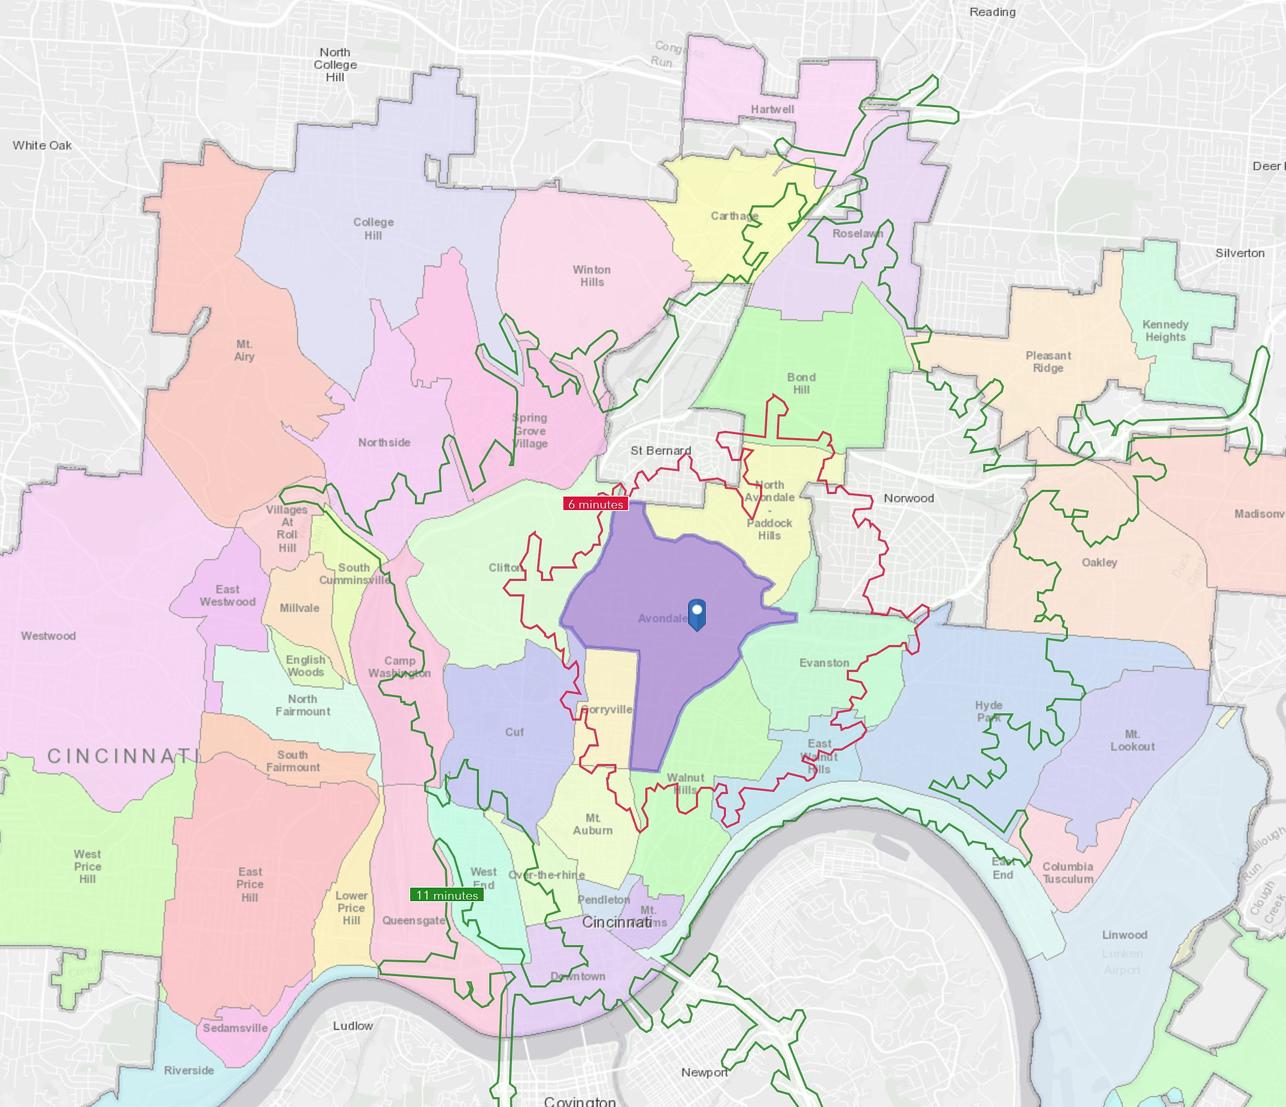 Map of neighborhoods in Cincinnati. Neighborhood of Avondale located in Uptown is an opportunity zone.